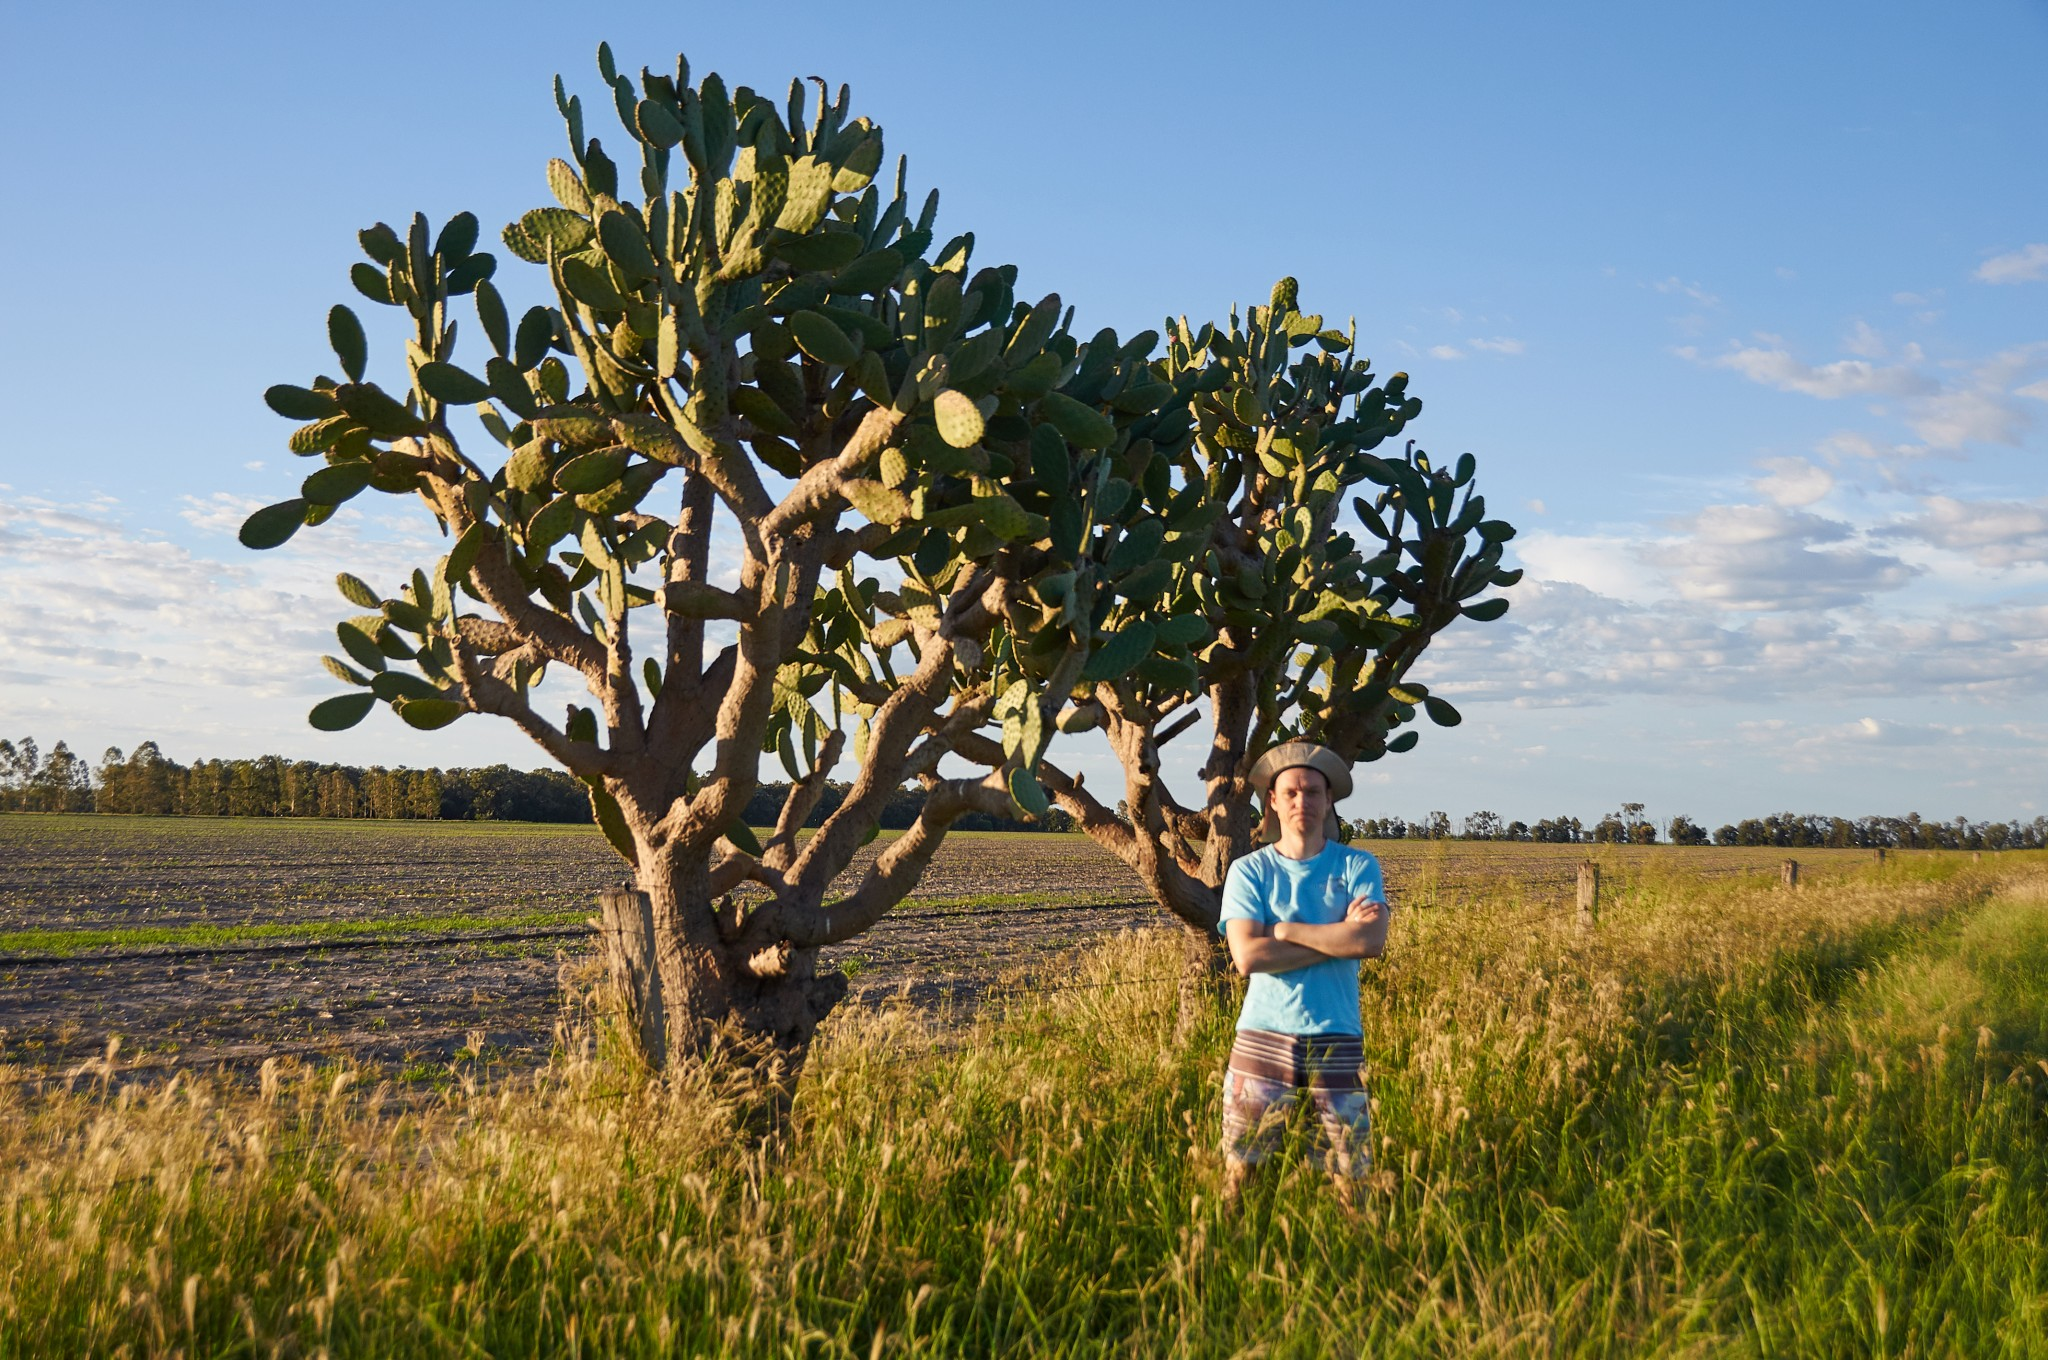 Andrey and local cacti ~ Андрюха и местные кактусы